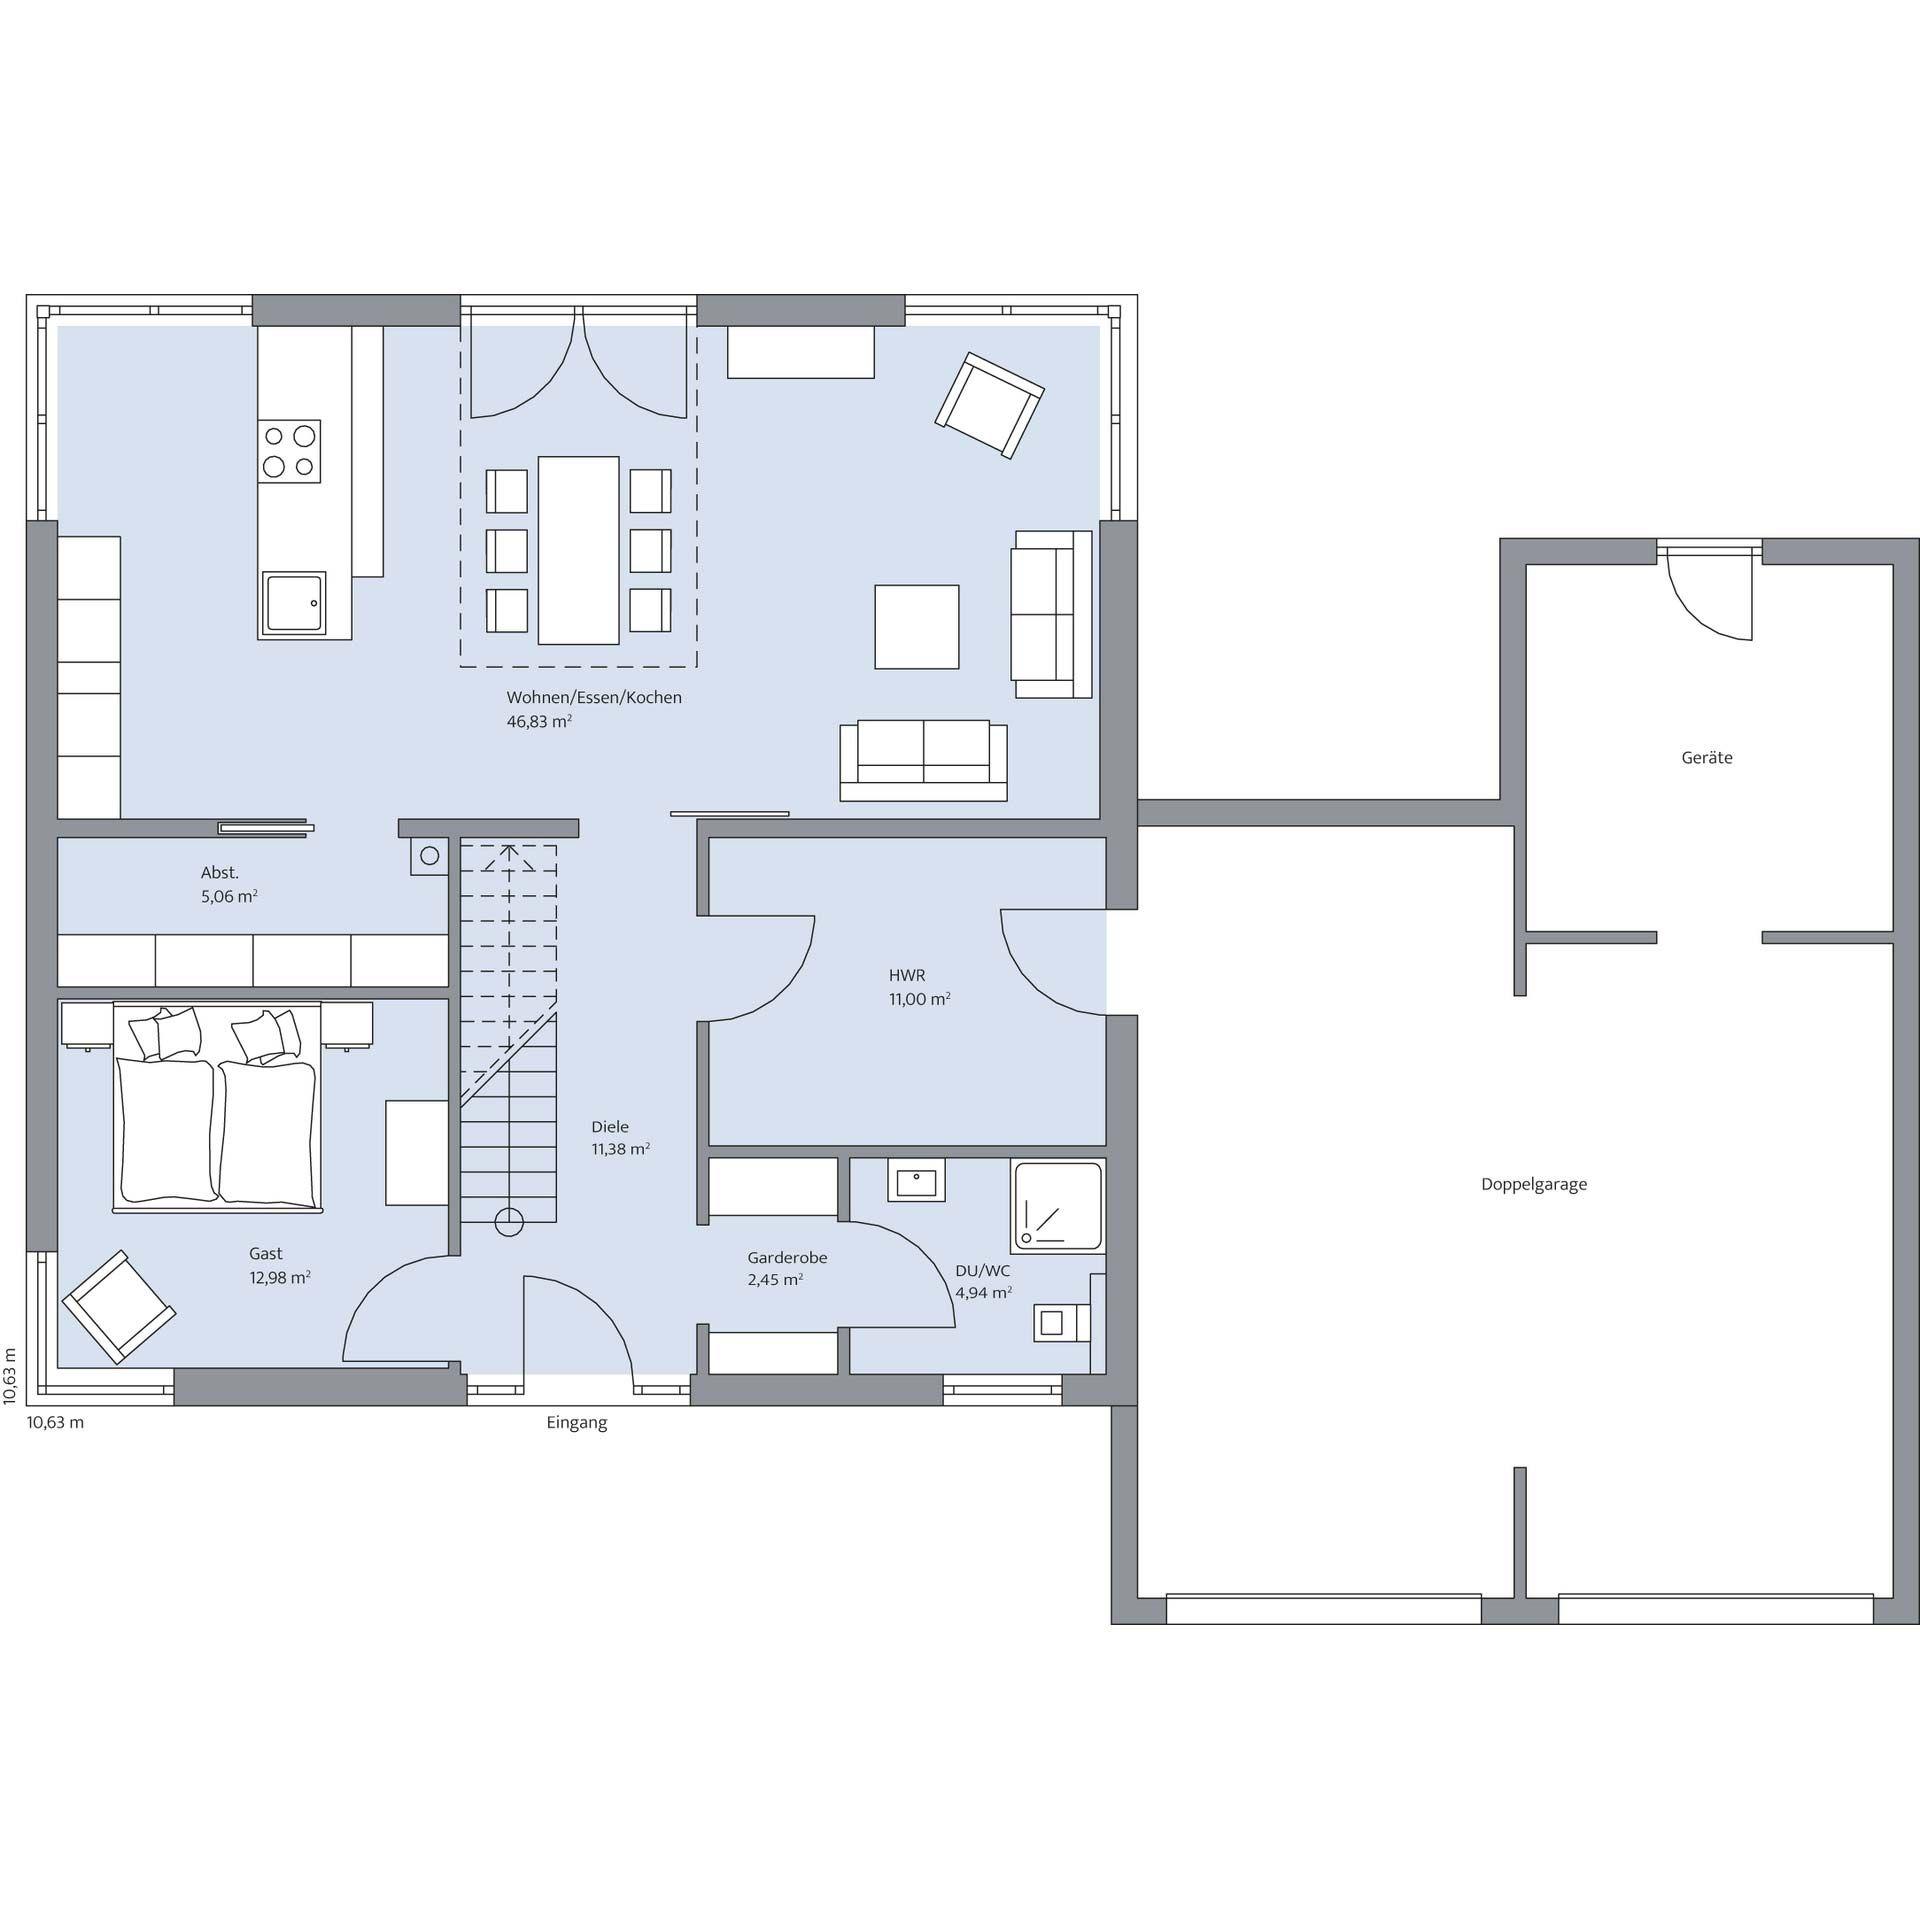 Kundenreferenz Haus Jessen - BAUMEISTER-HAUS® Kooperation e.V. #arquitectonico